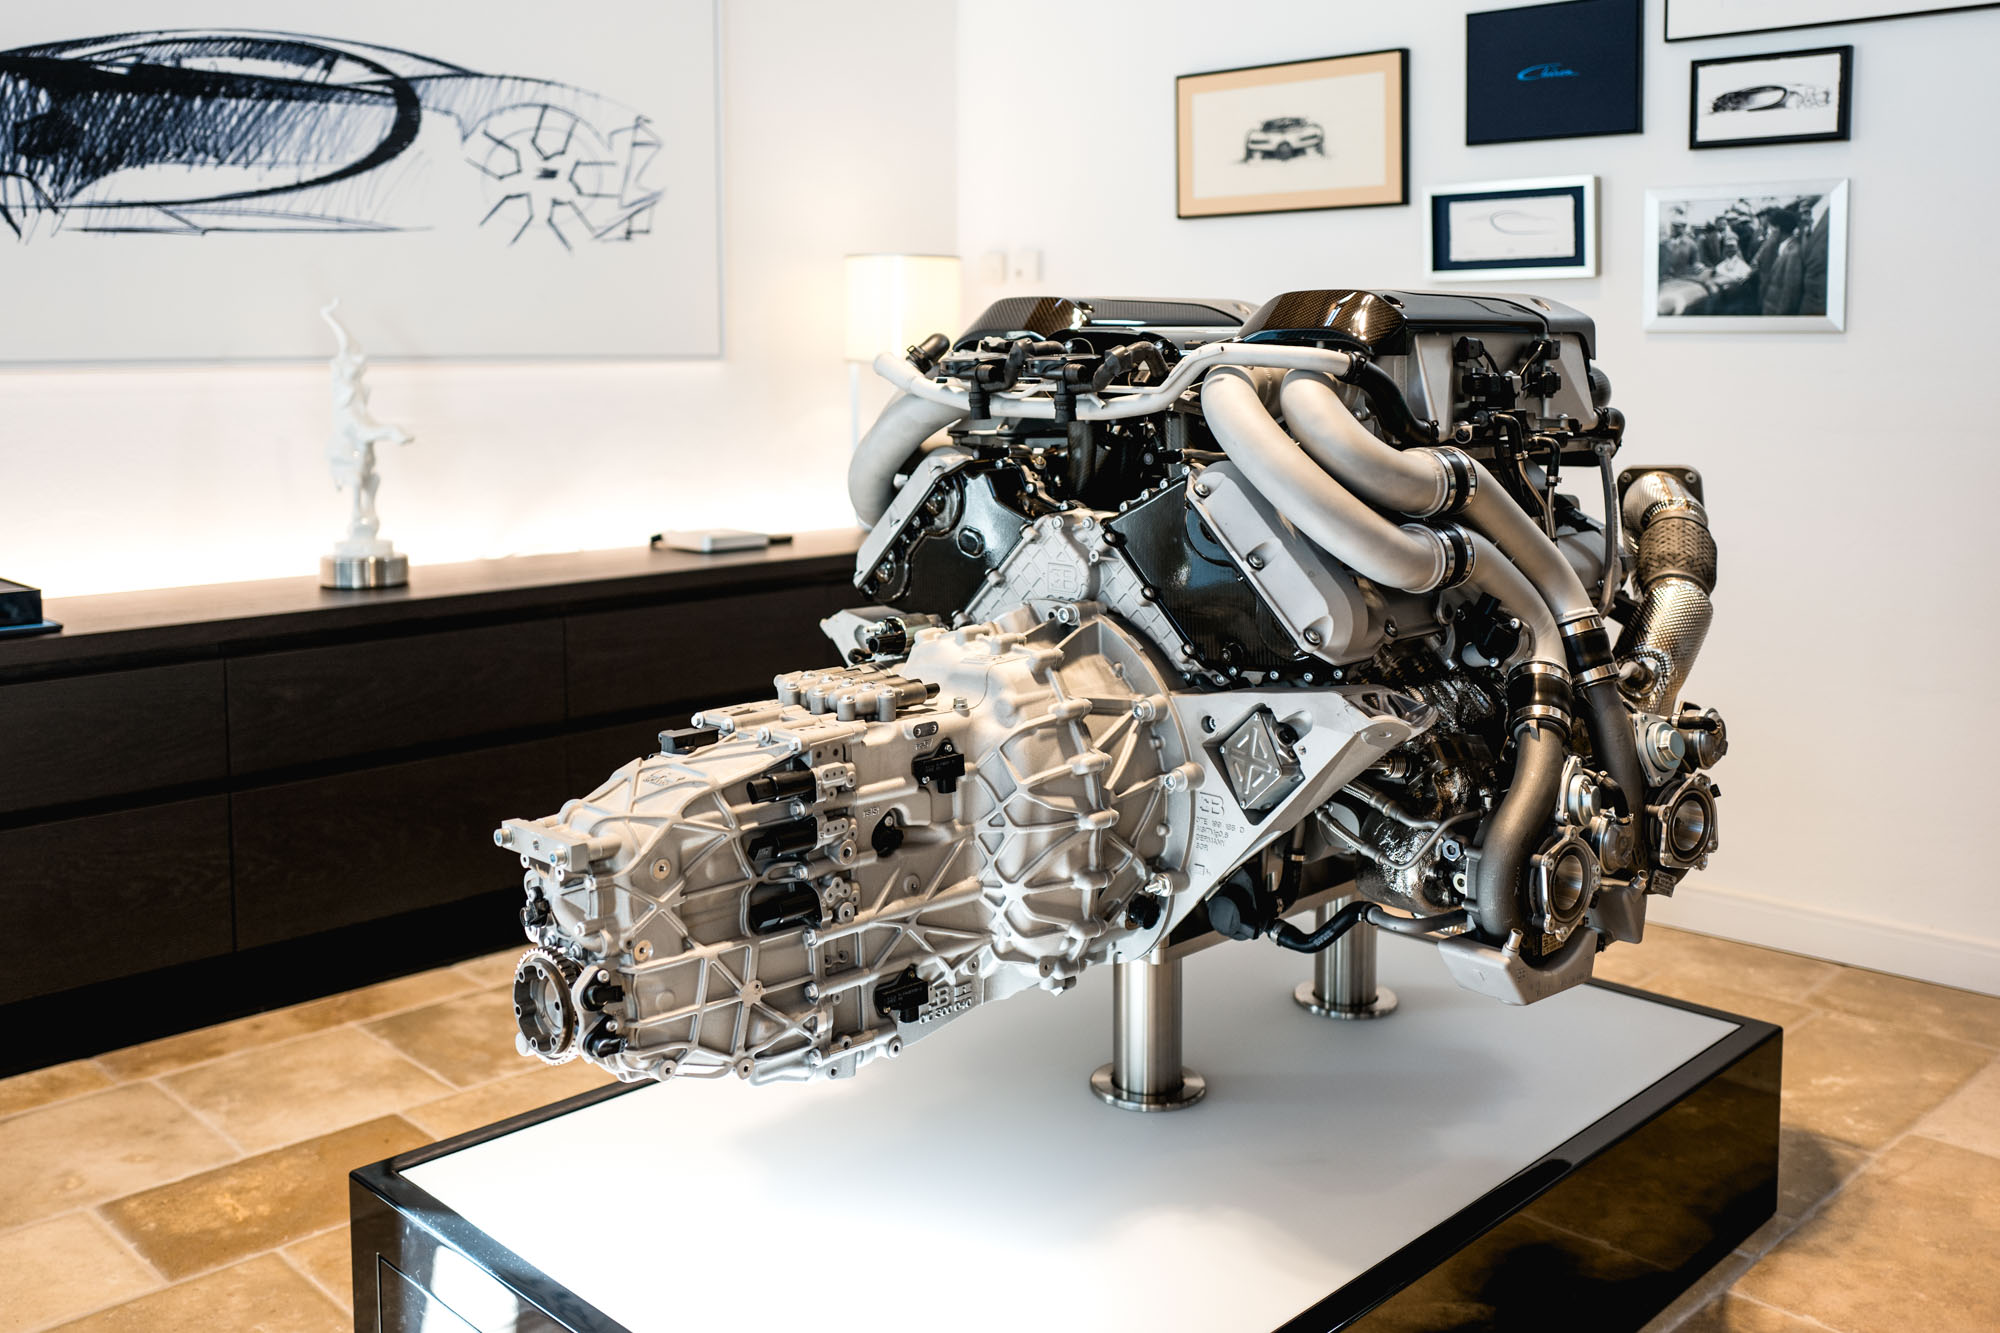 Ateliers Bugatti à Molsheim - Remise sud - Moteur W16